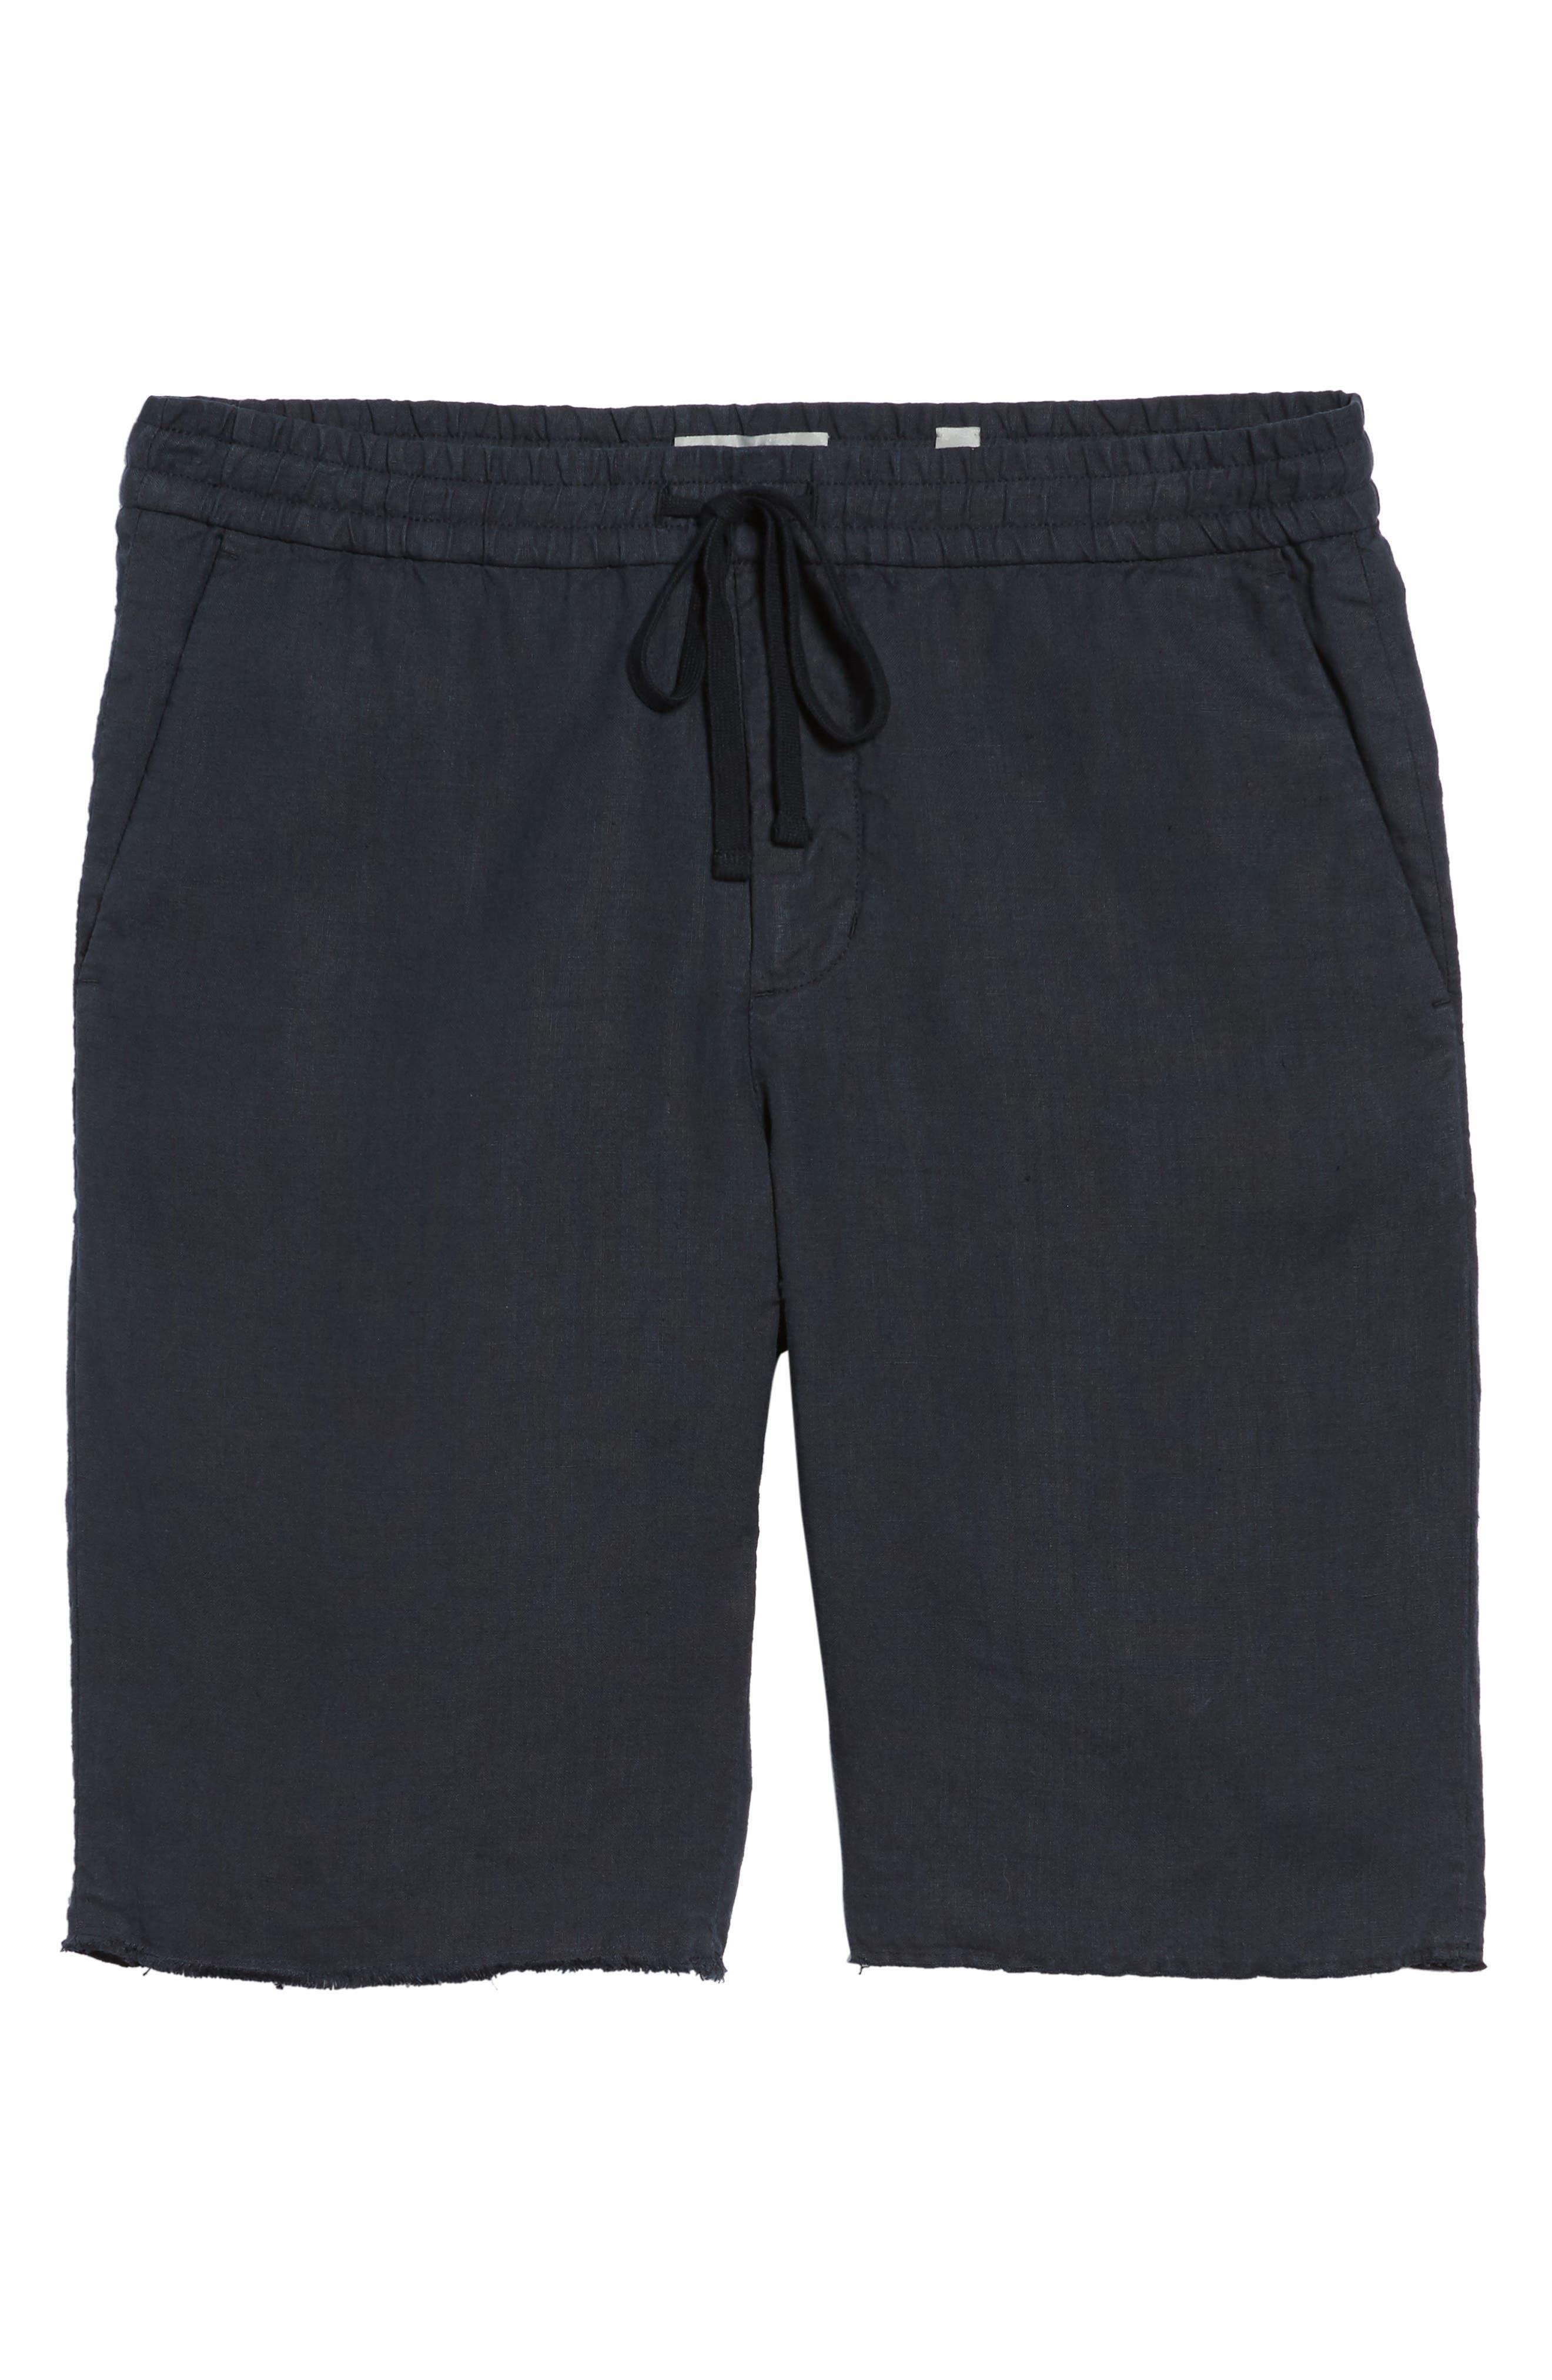 Raw Hem Slim Fit Track Shorts,                             Alternate thumbnail 6, color,                             NEW COASTAL